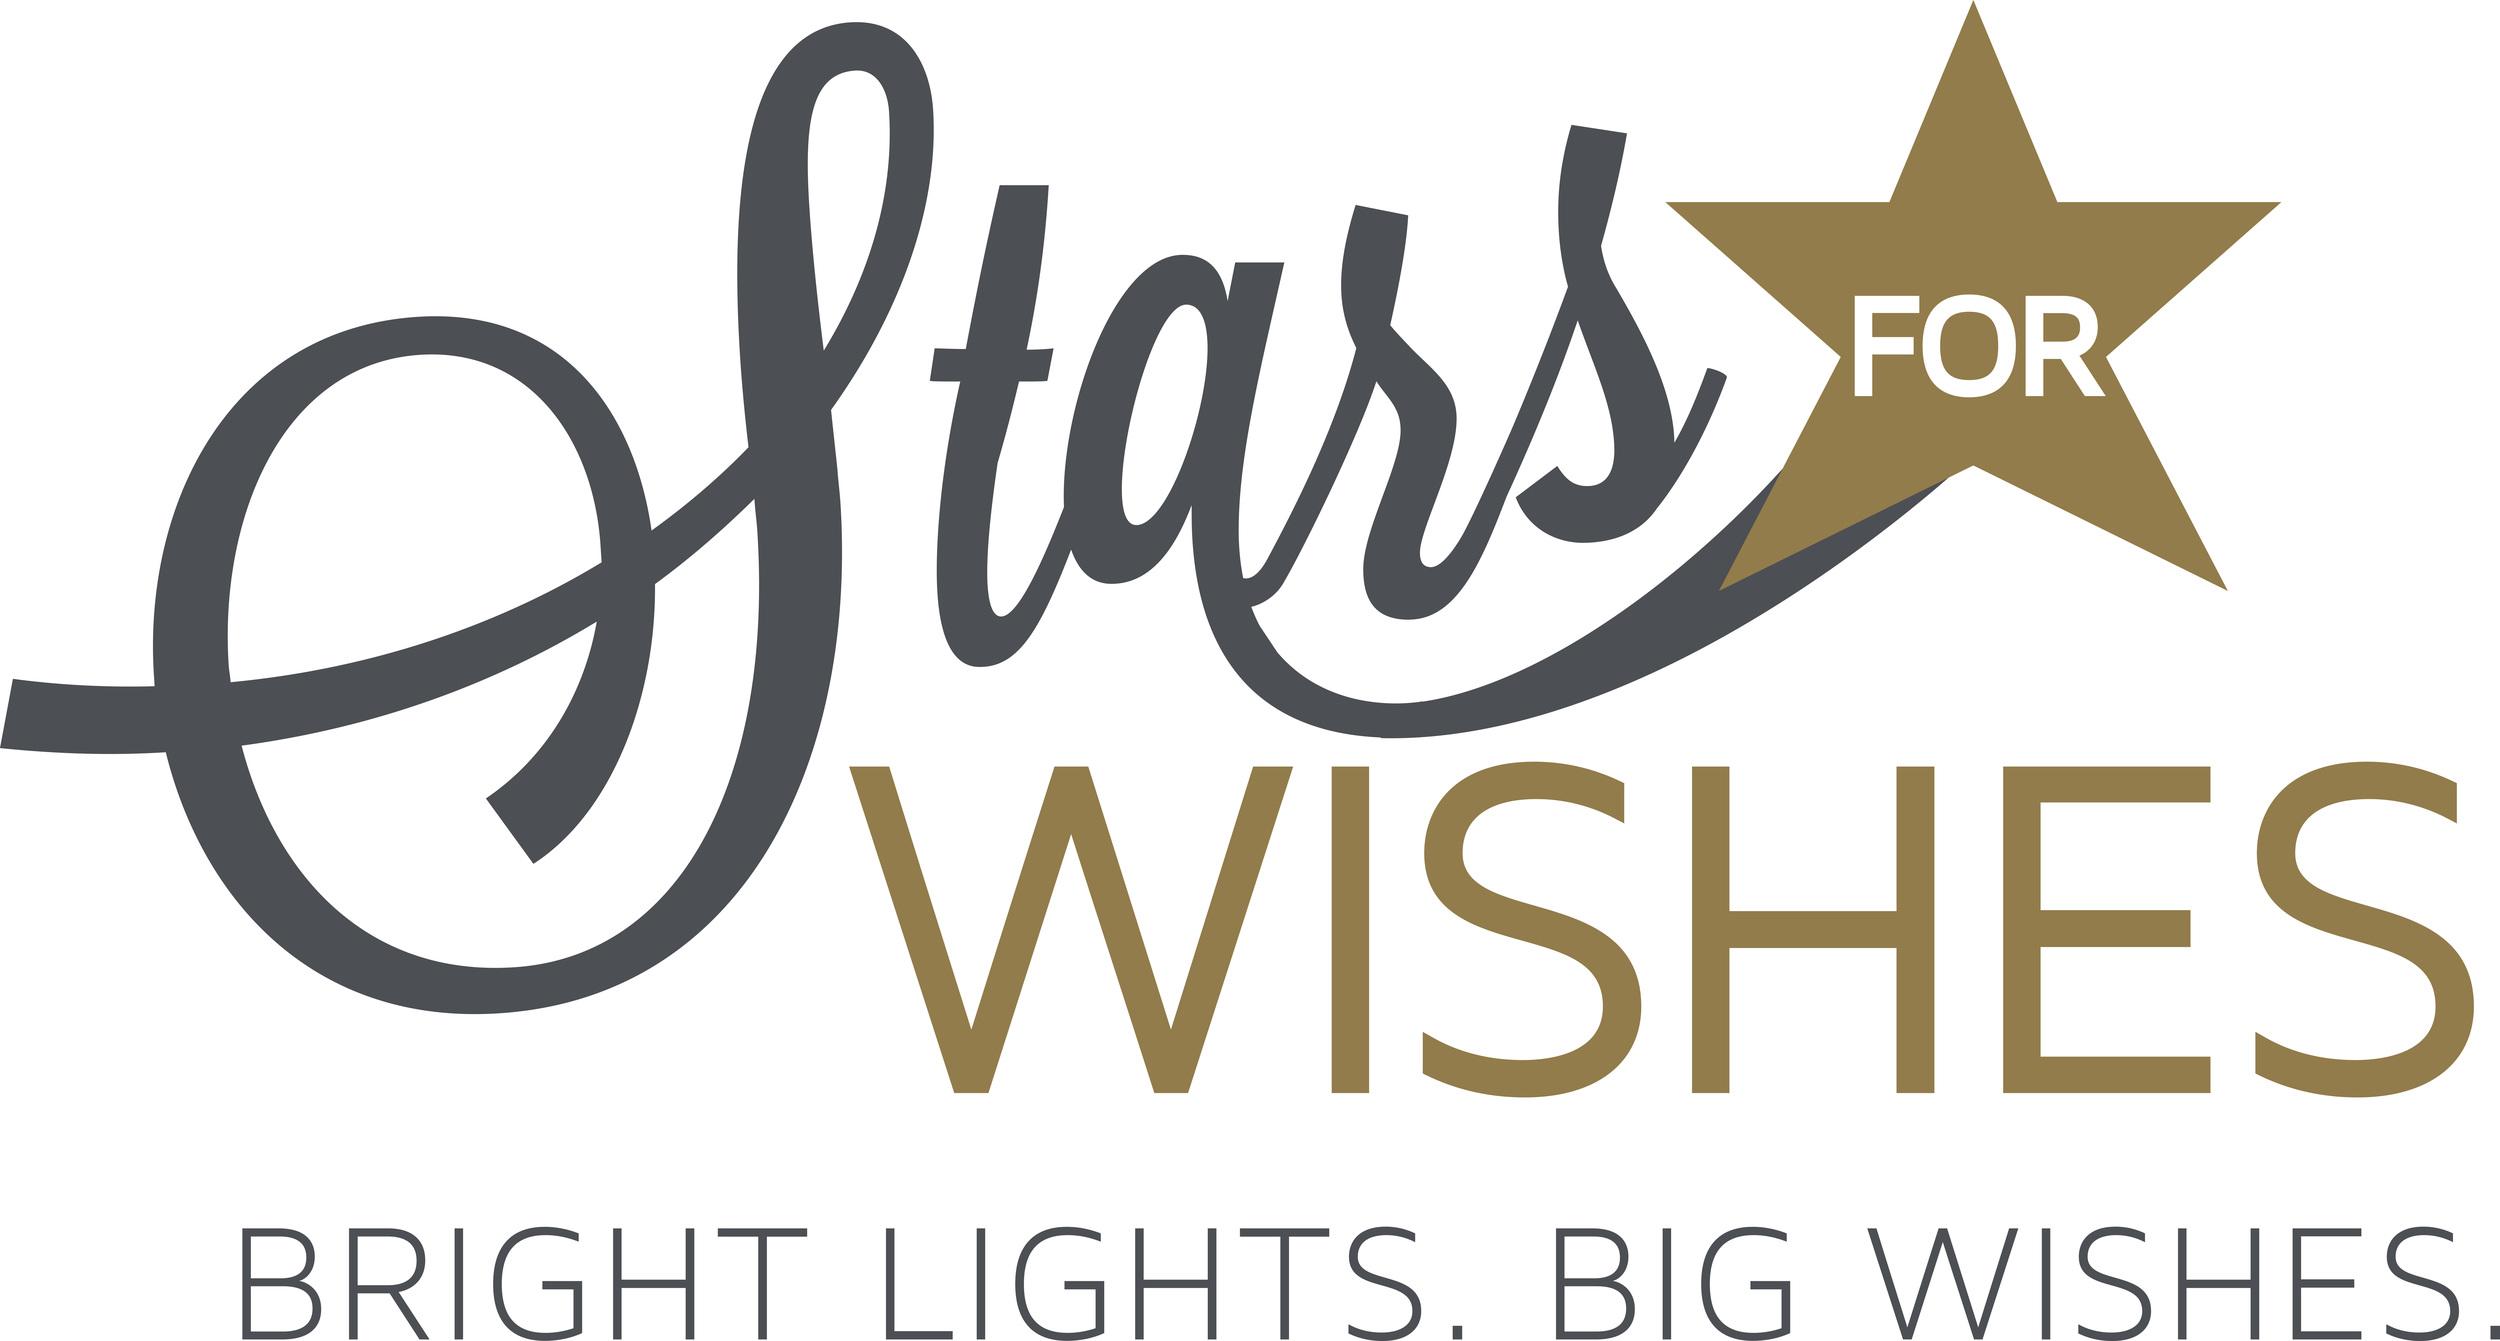 starsforwishes_logo_theme_lrg.jpg